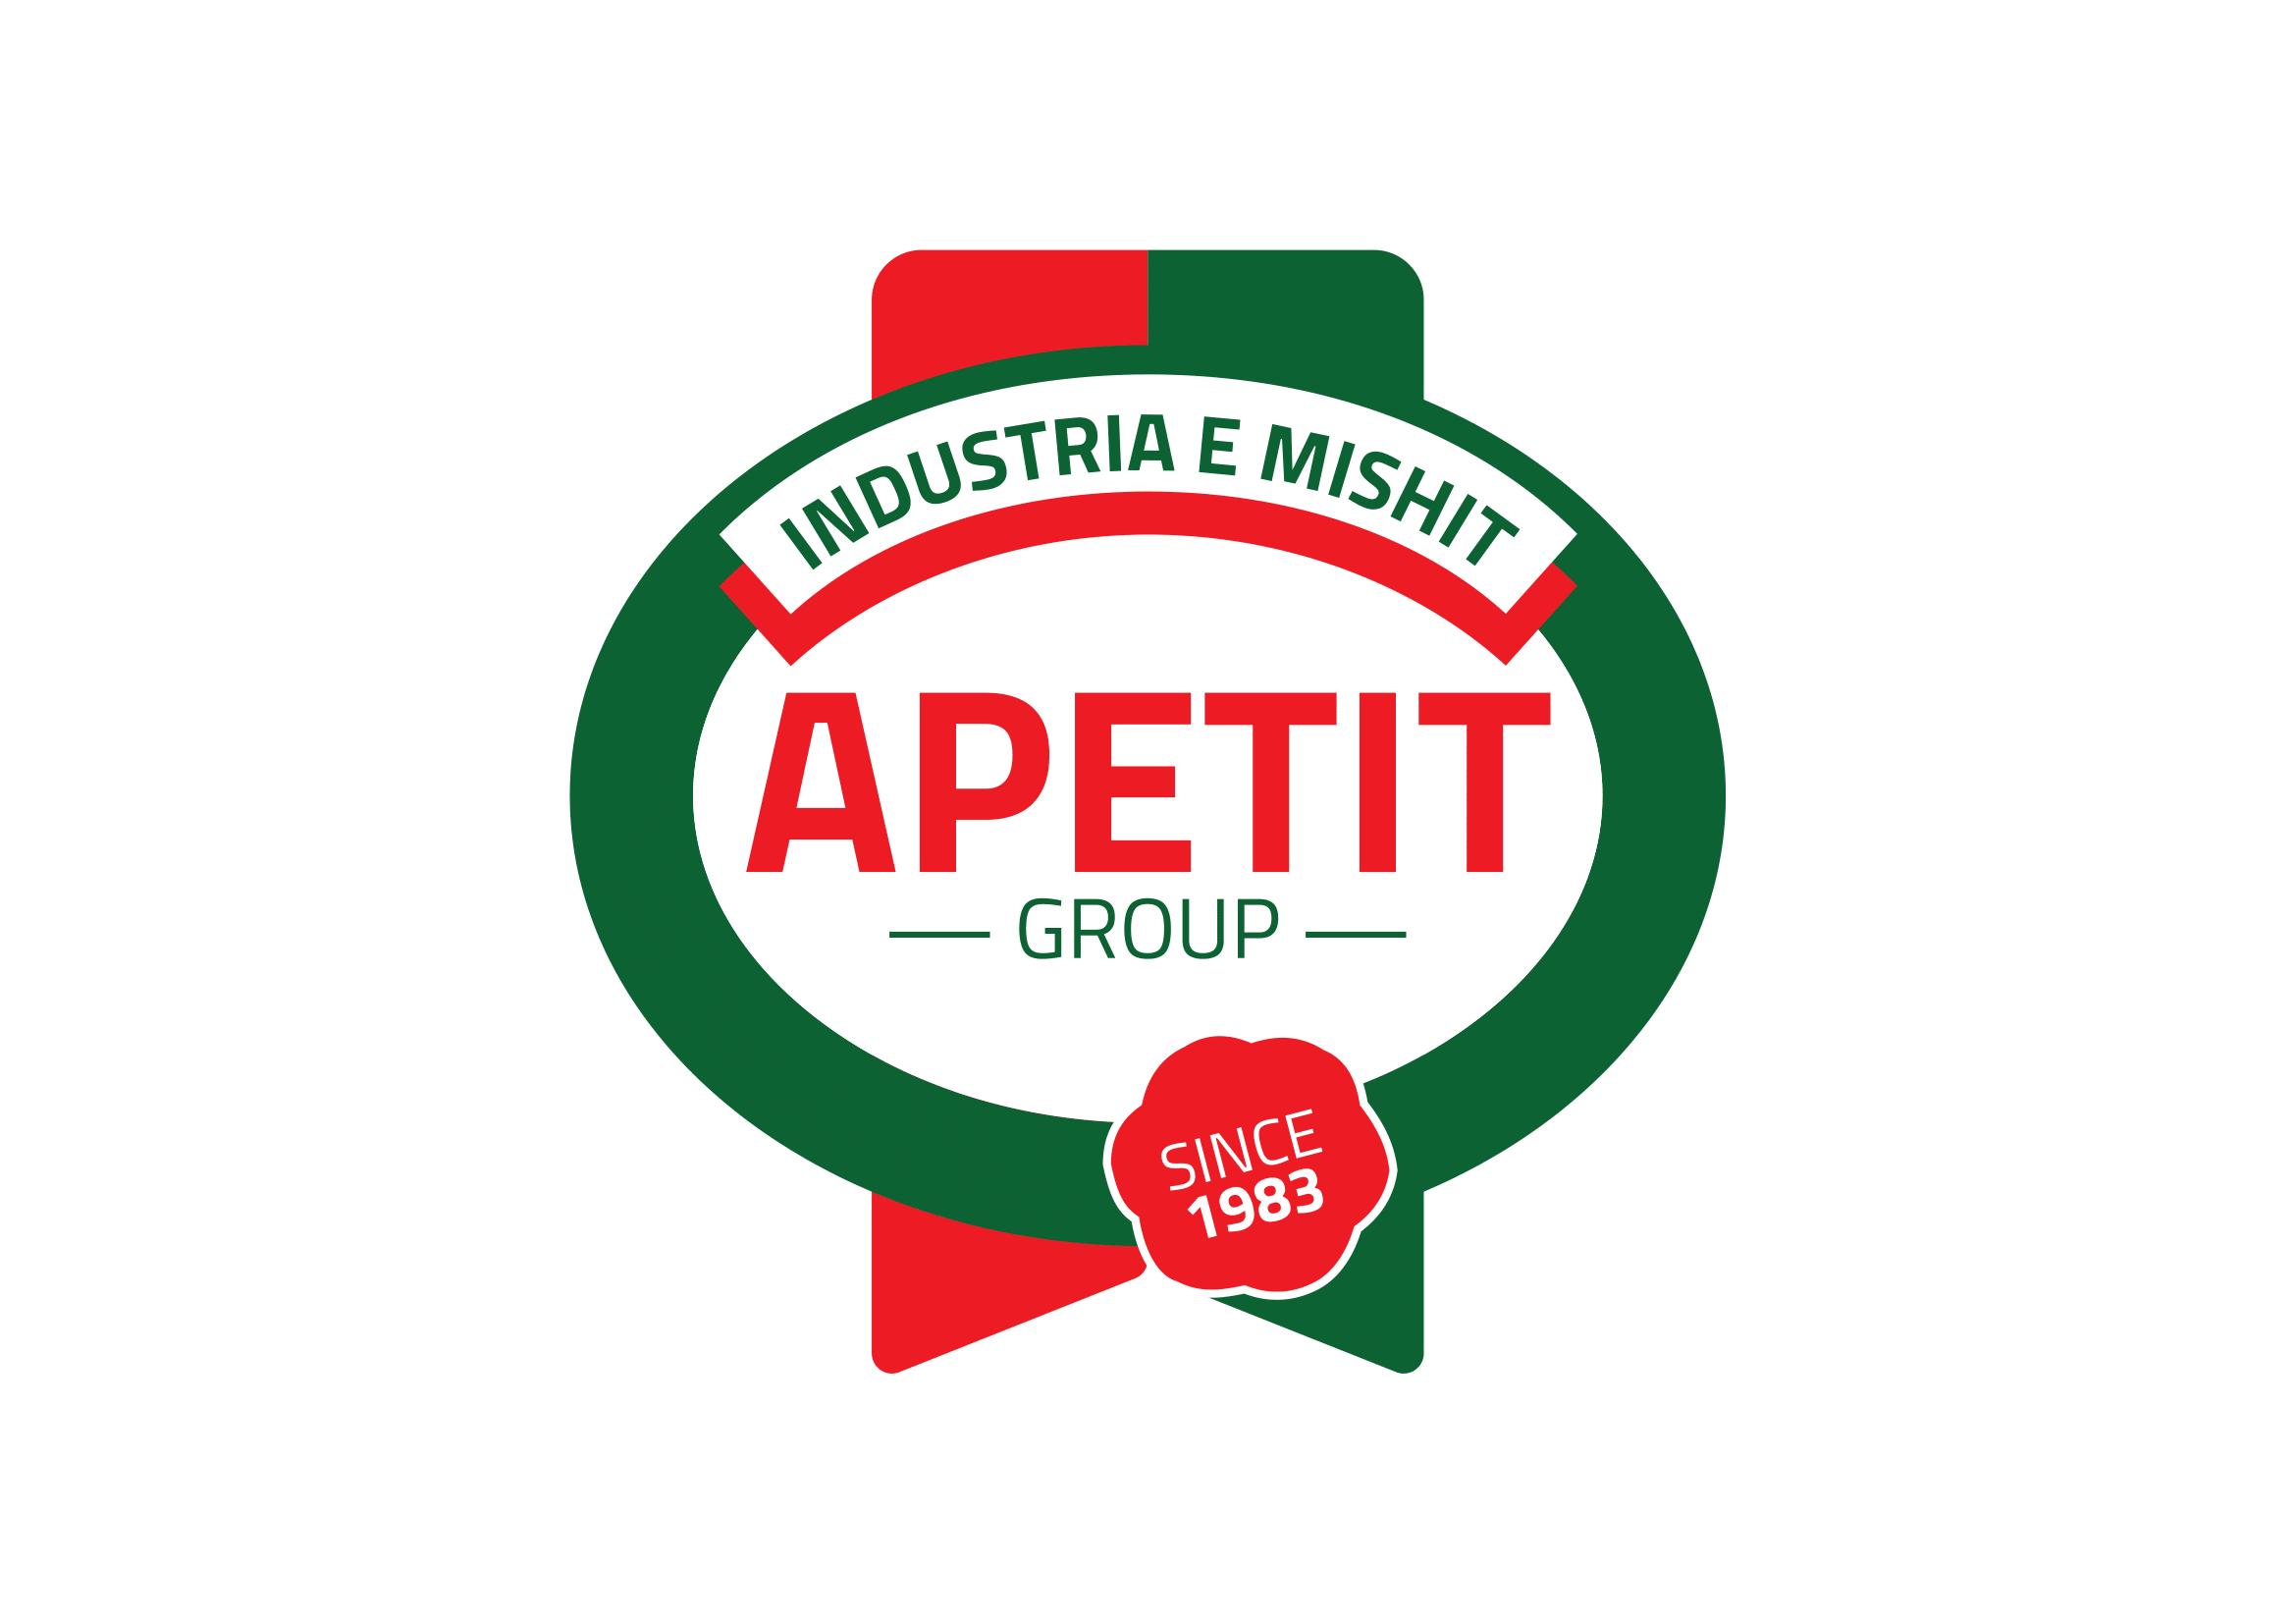 Apetit-Group-logo (1)-1